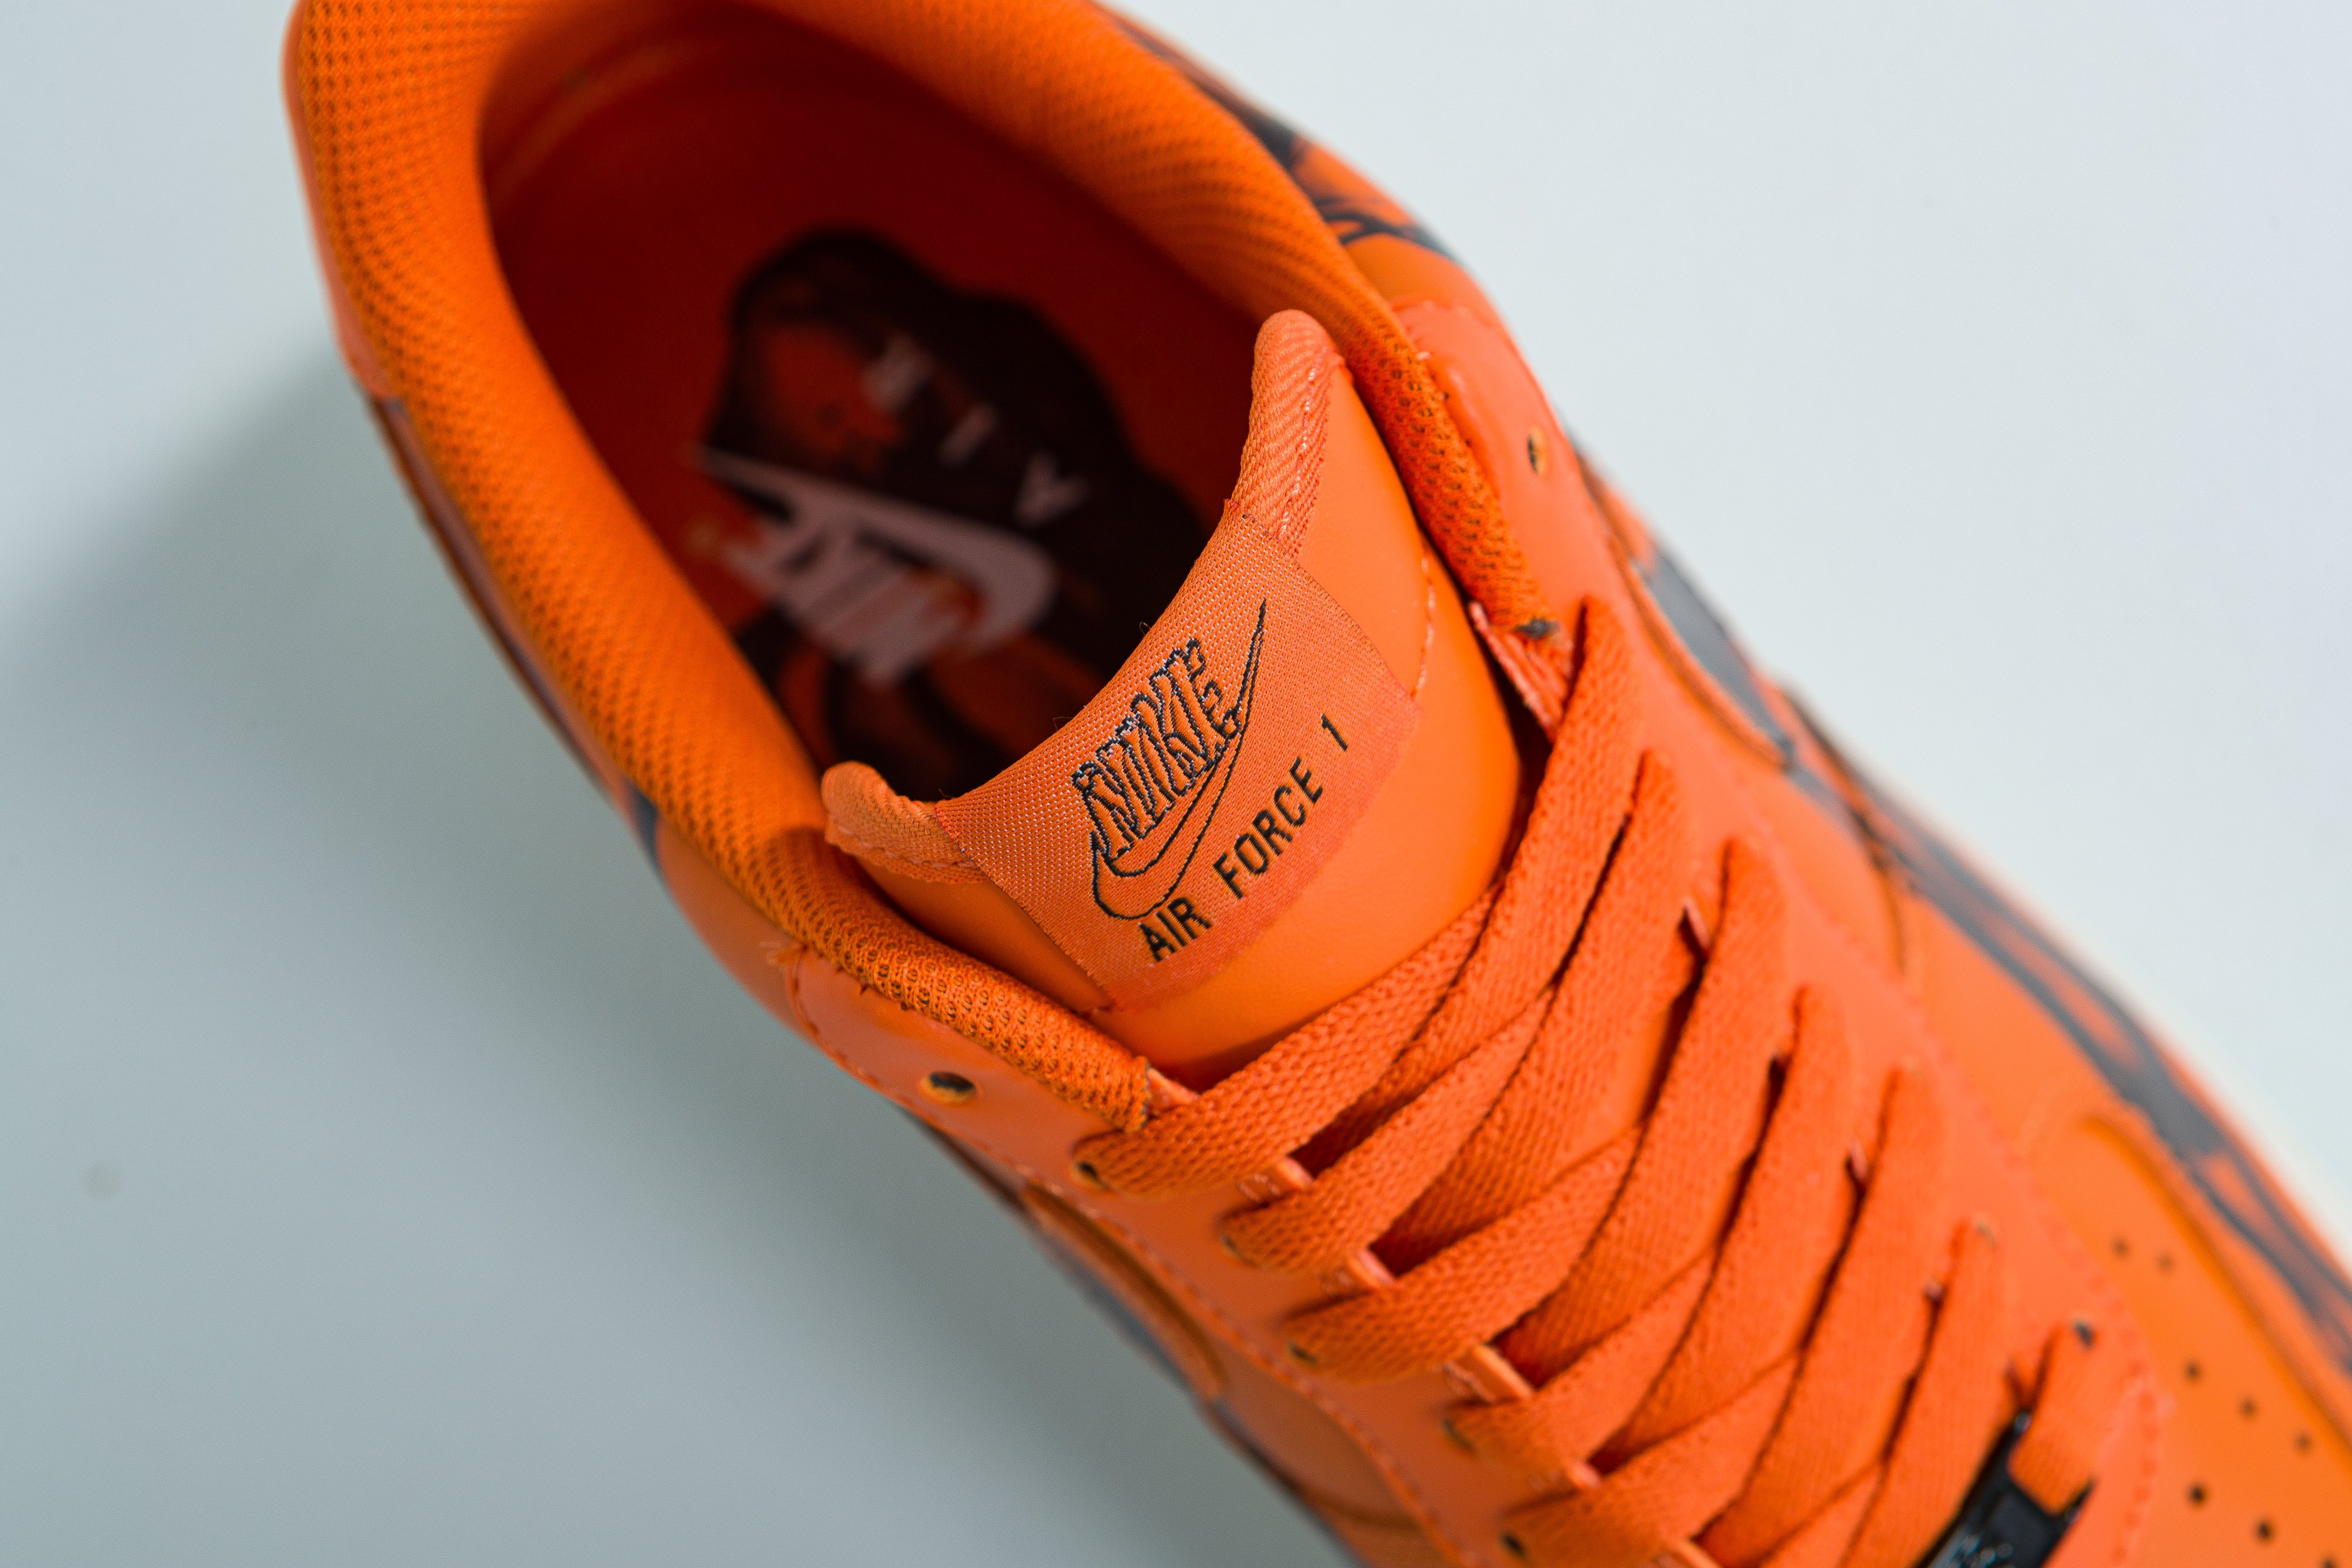 Nike - Air Force 1 07' Skeleton QS - Starfish/Starfish-Black - Up There